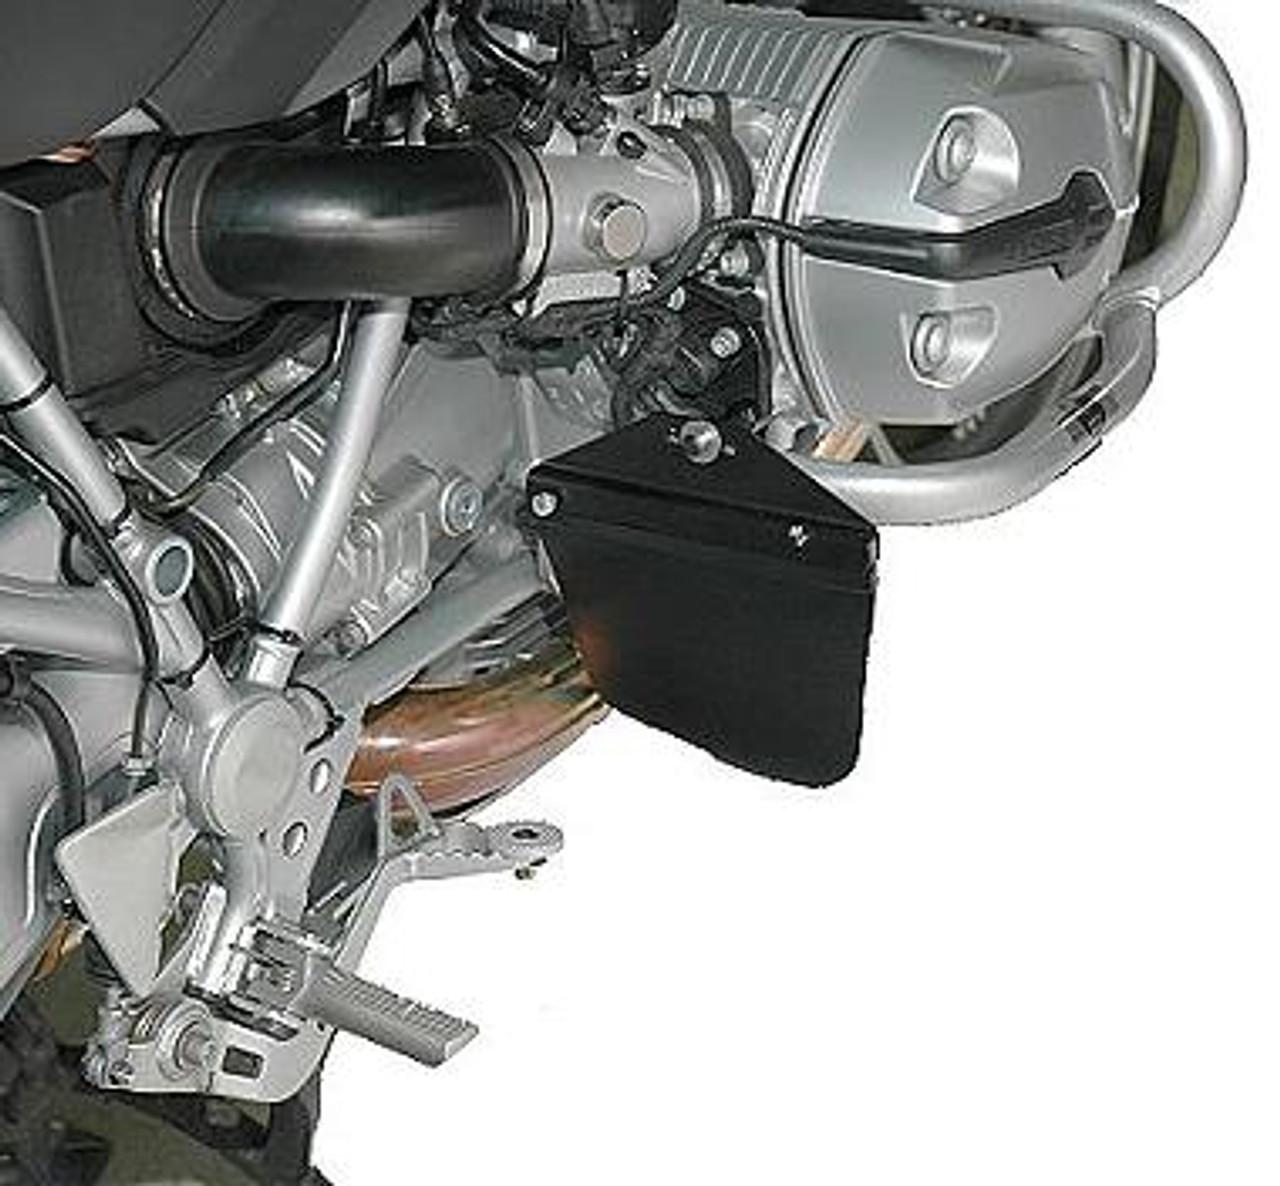 Engine Mount Splash Guards fits many R1200 R1150 R1100